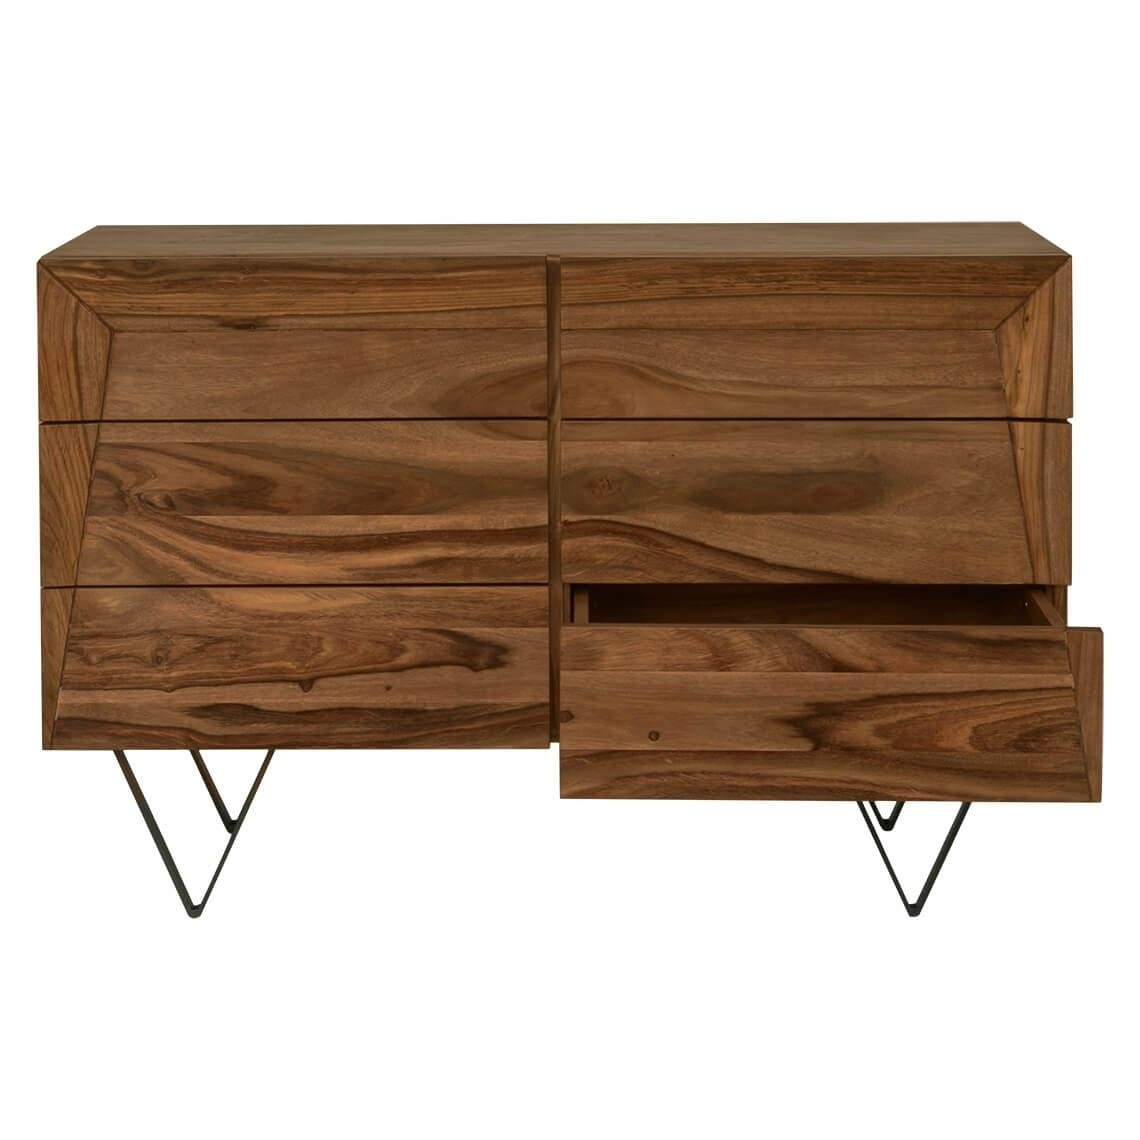 Wyatt Dresser | Freedom regarding Wyatt Sideboards (Image 27 of 30)